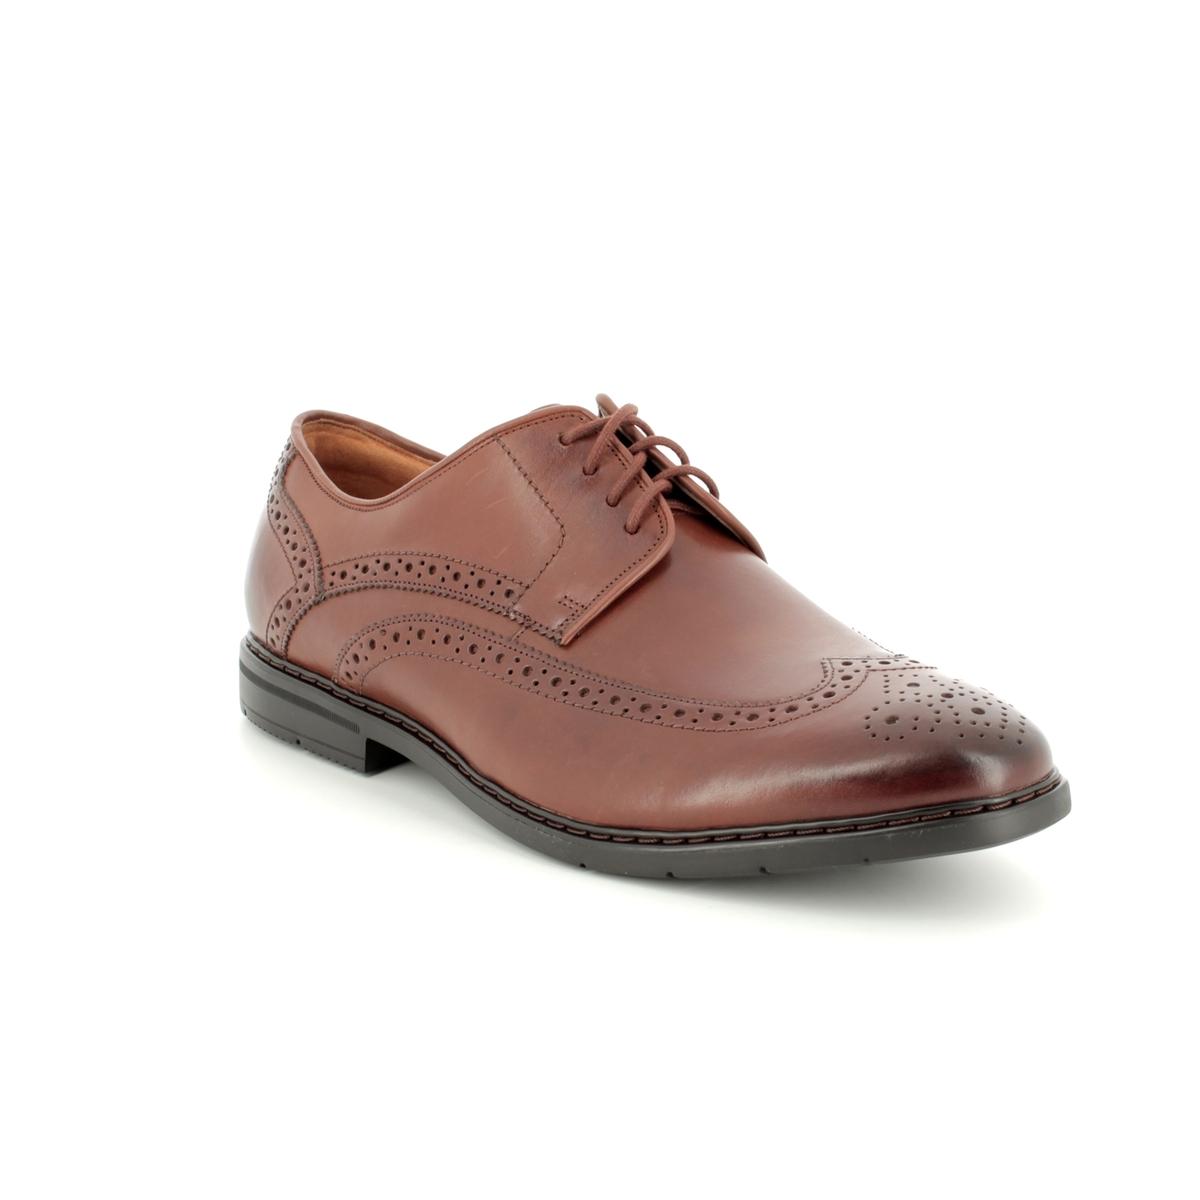 bc6e69869b2c3 Clarks Formal Shoes - Tan - 3224/37G BANBURY LIMIT